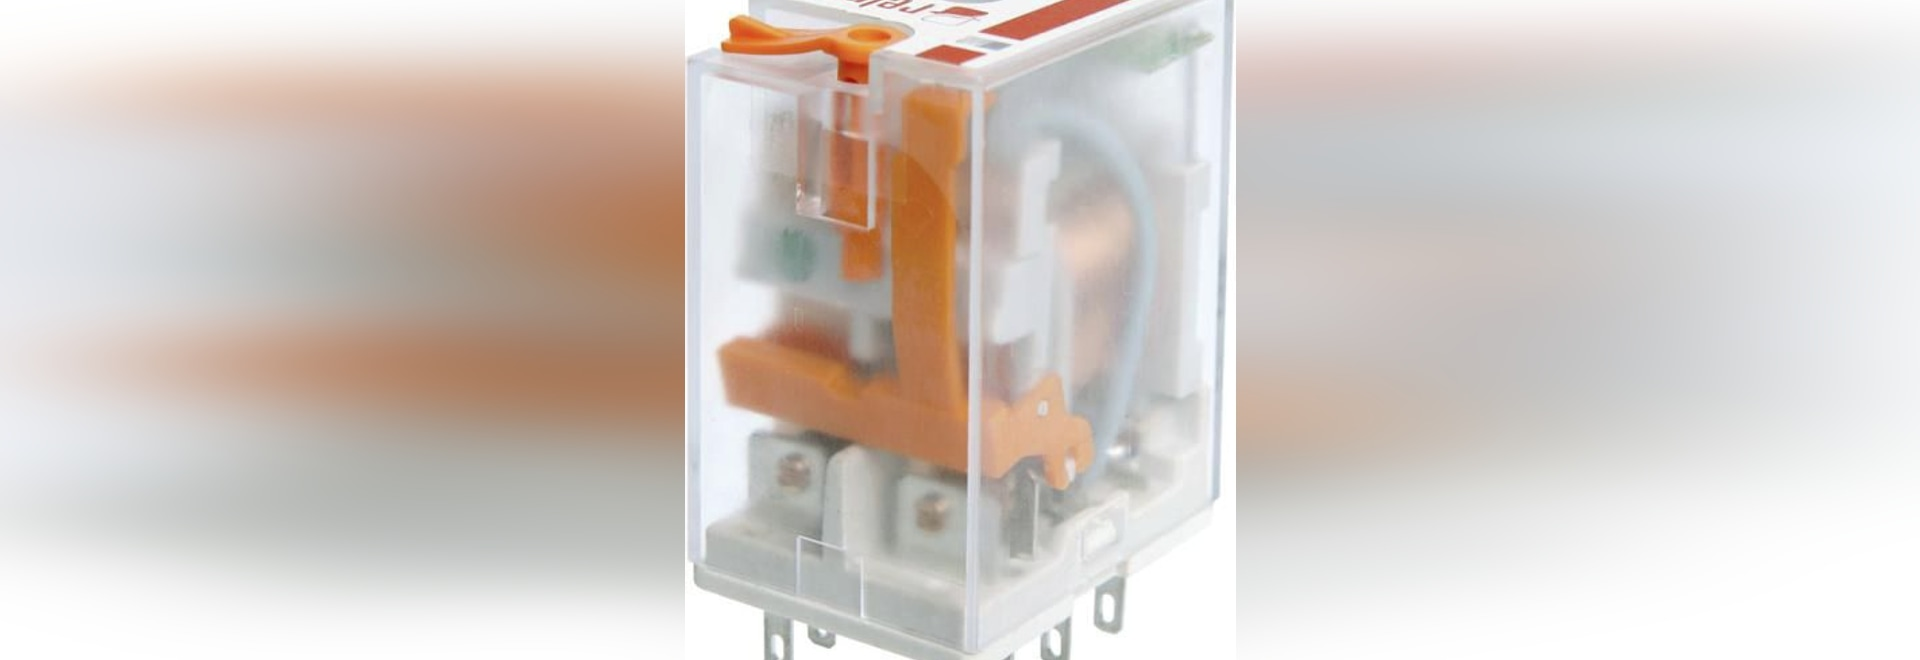 NEW: electromechanical relay by RELPOL